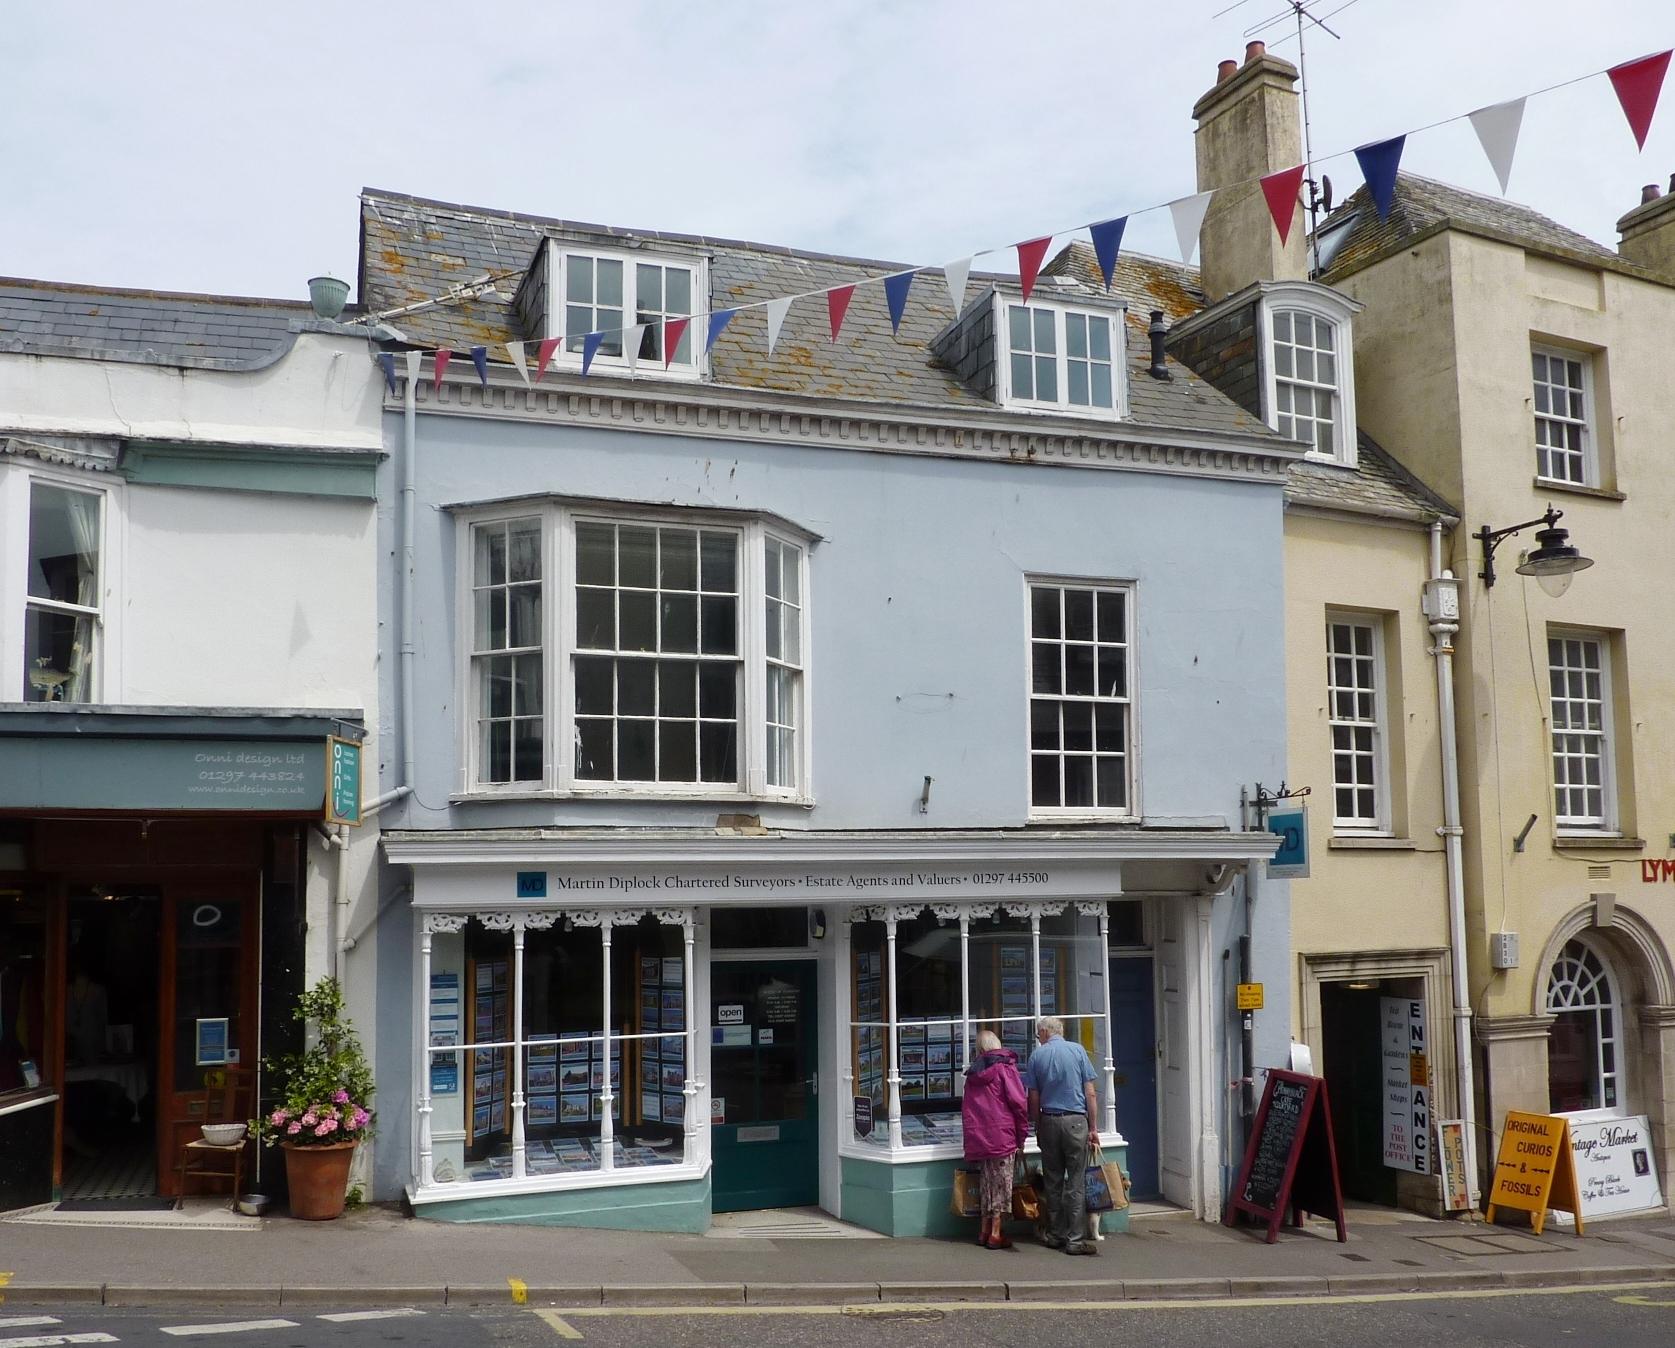 2 Bedrooms Maisonette Flat for sale in Lyme Regis